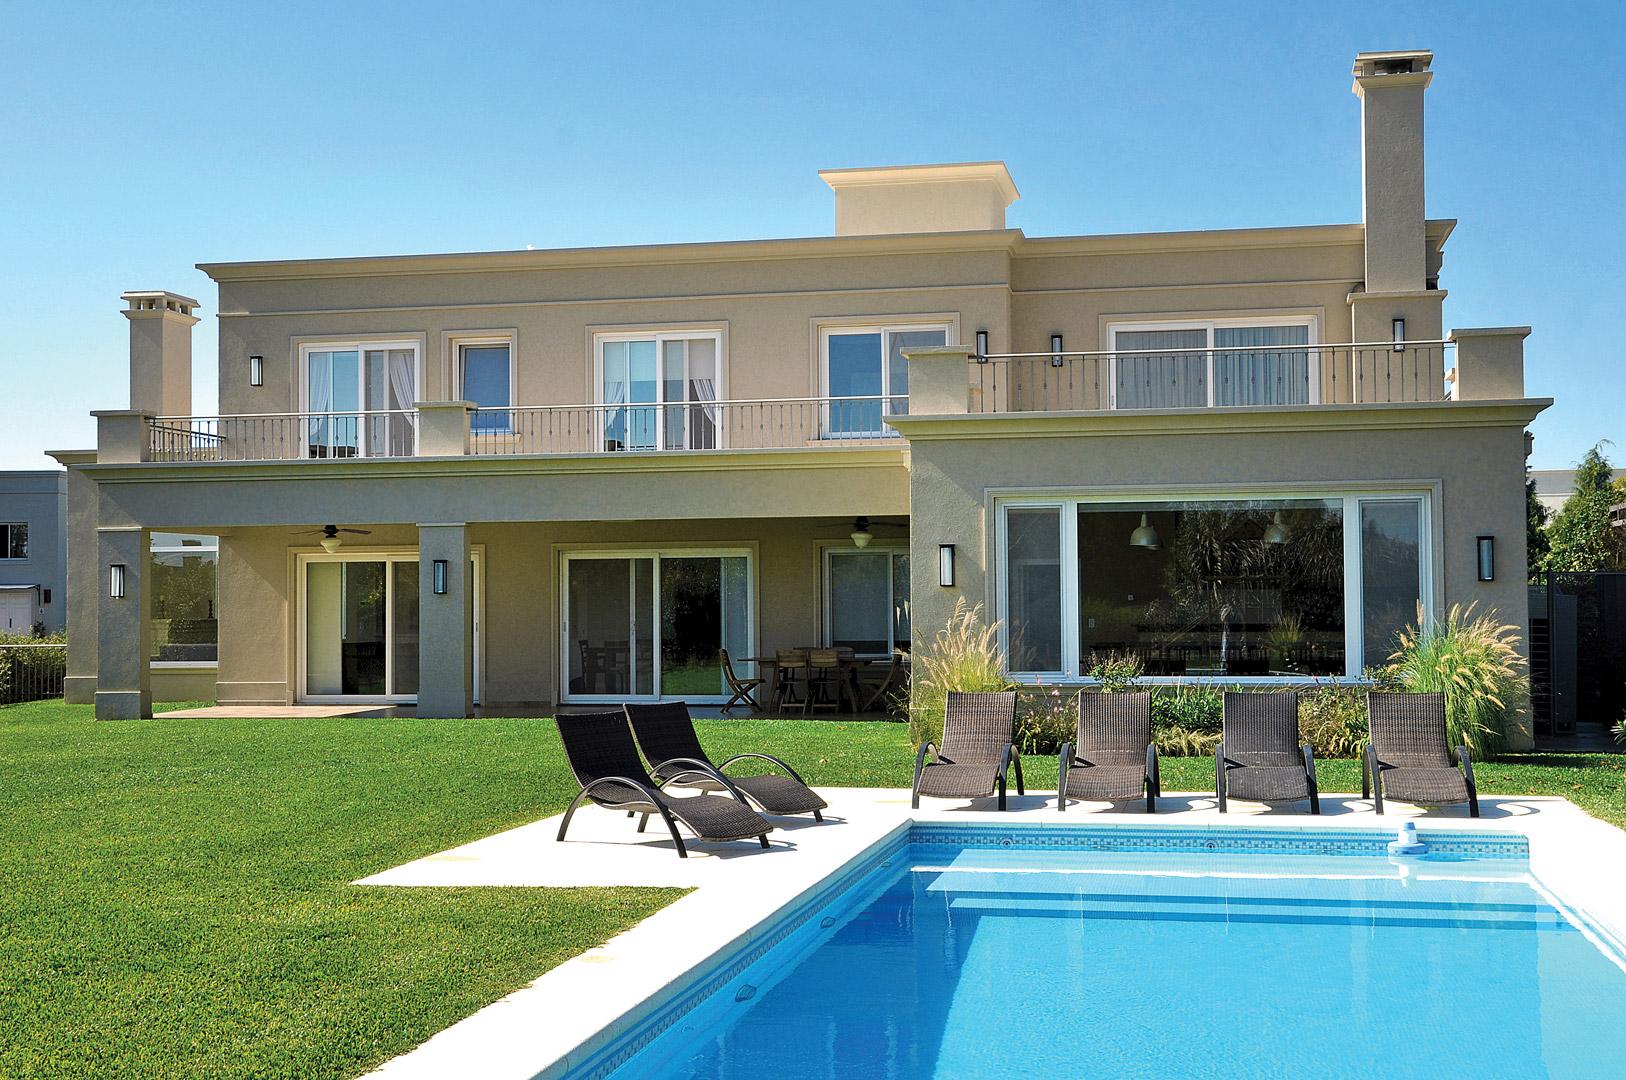 Estilos de casas modernas vidal bianchi casa estilo cl for Estilos de casas modernas